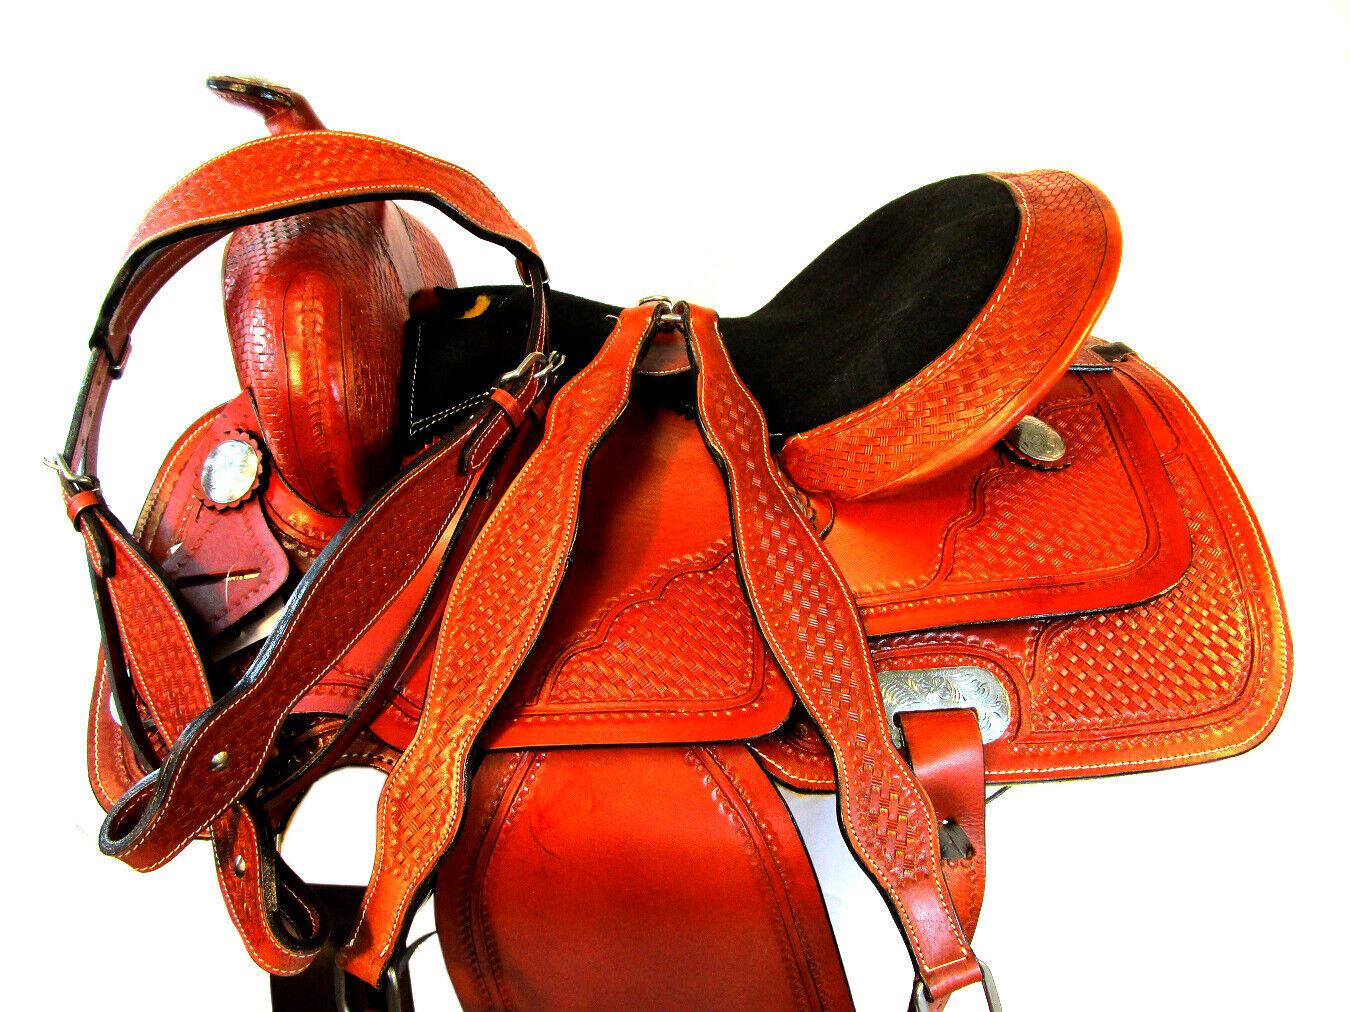 CLASSIC BASKET WEAVED WESTERN HORSE SADDLE 15 16 BARREL TRAIL PLEASURE